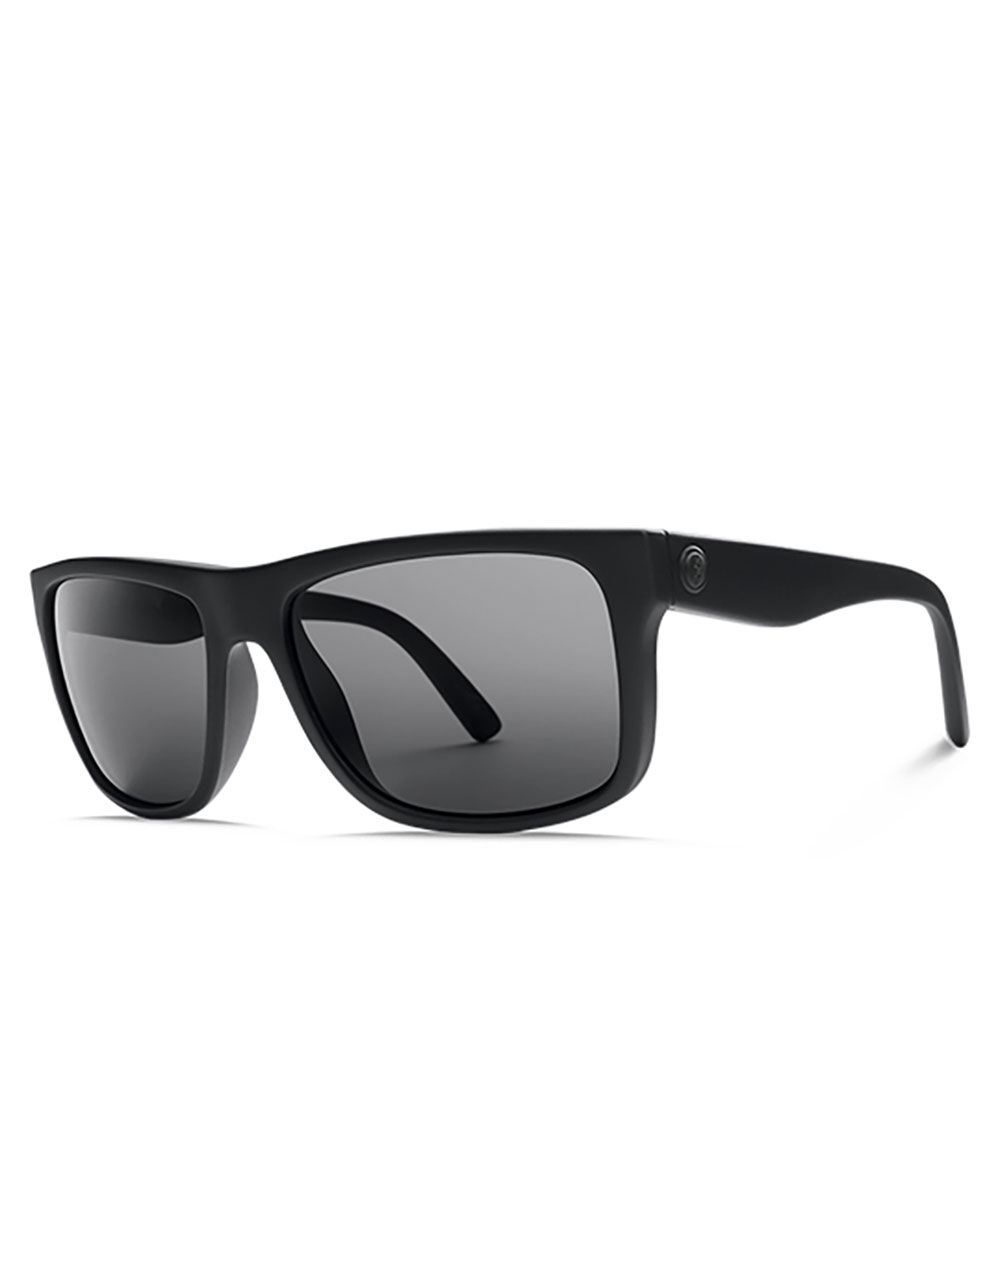 ELECTRIC Swingarm Polarized Sunglasses